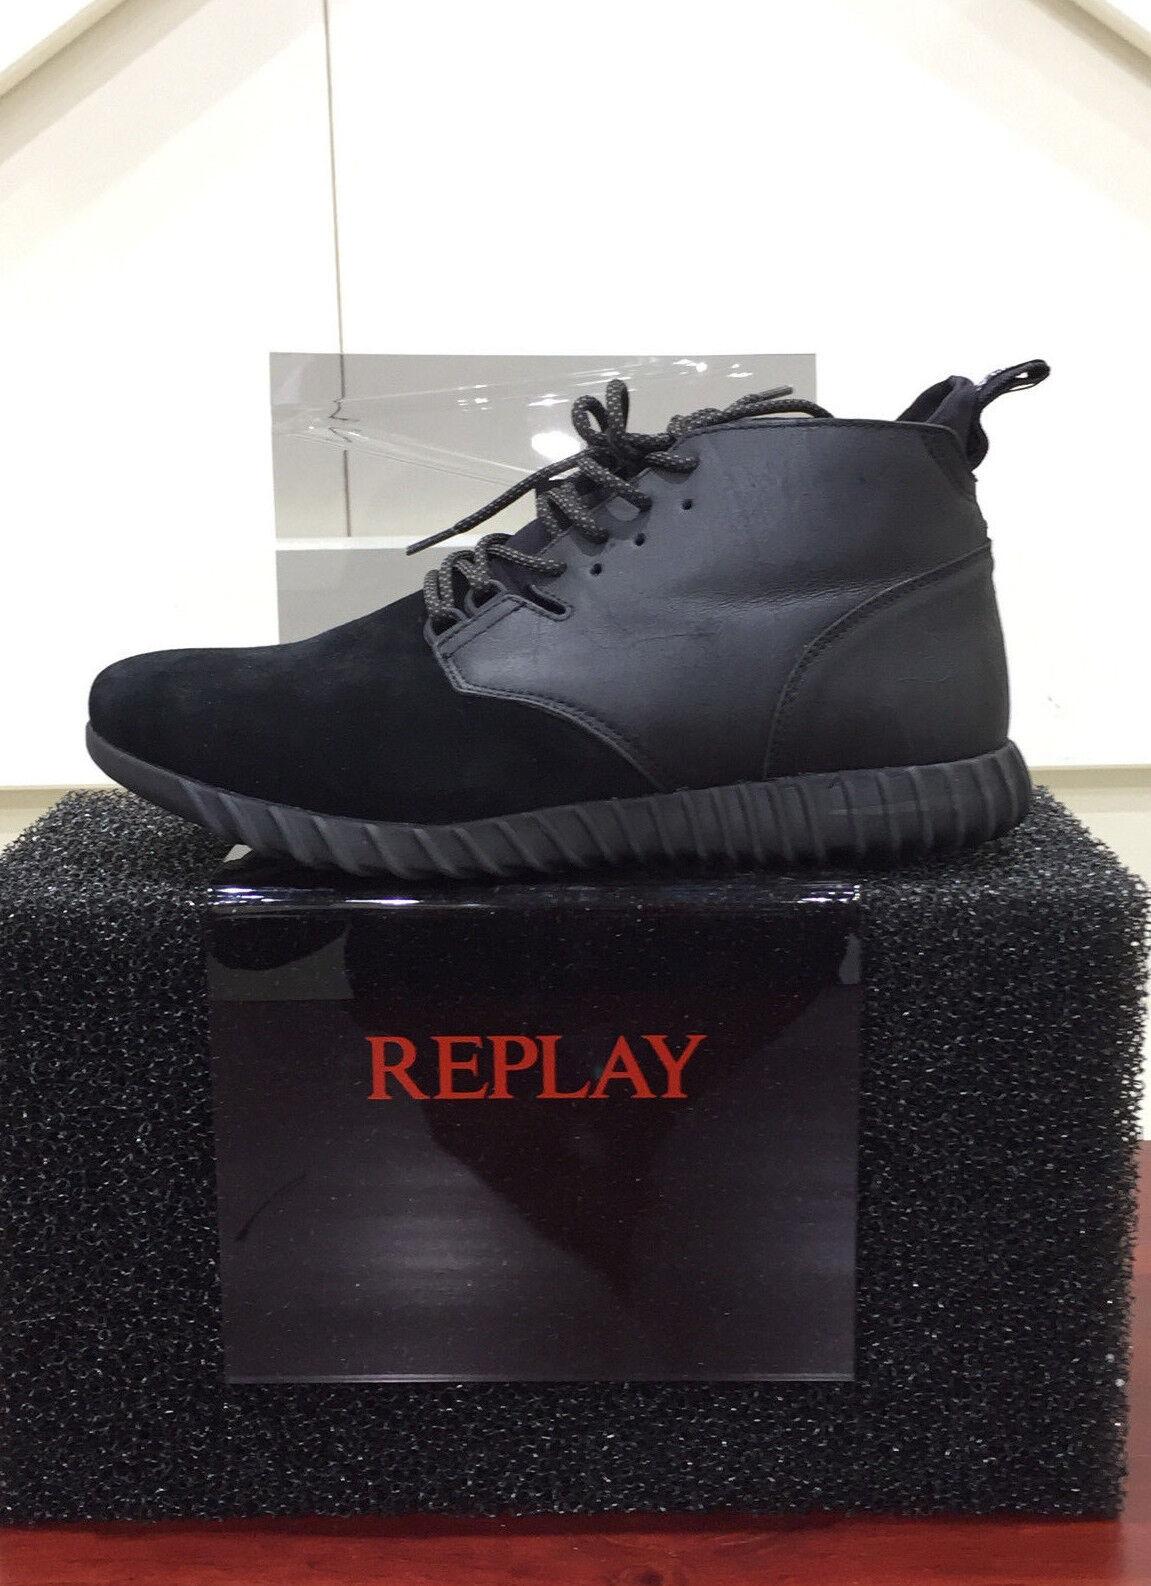 Replay Chaussures Hommes Chaussures De Loisirs Chaussures paniers véritable cuir stamford Noir